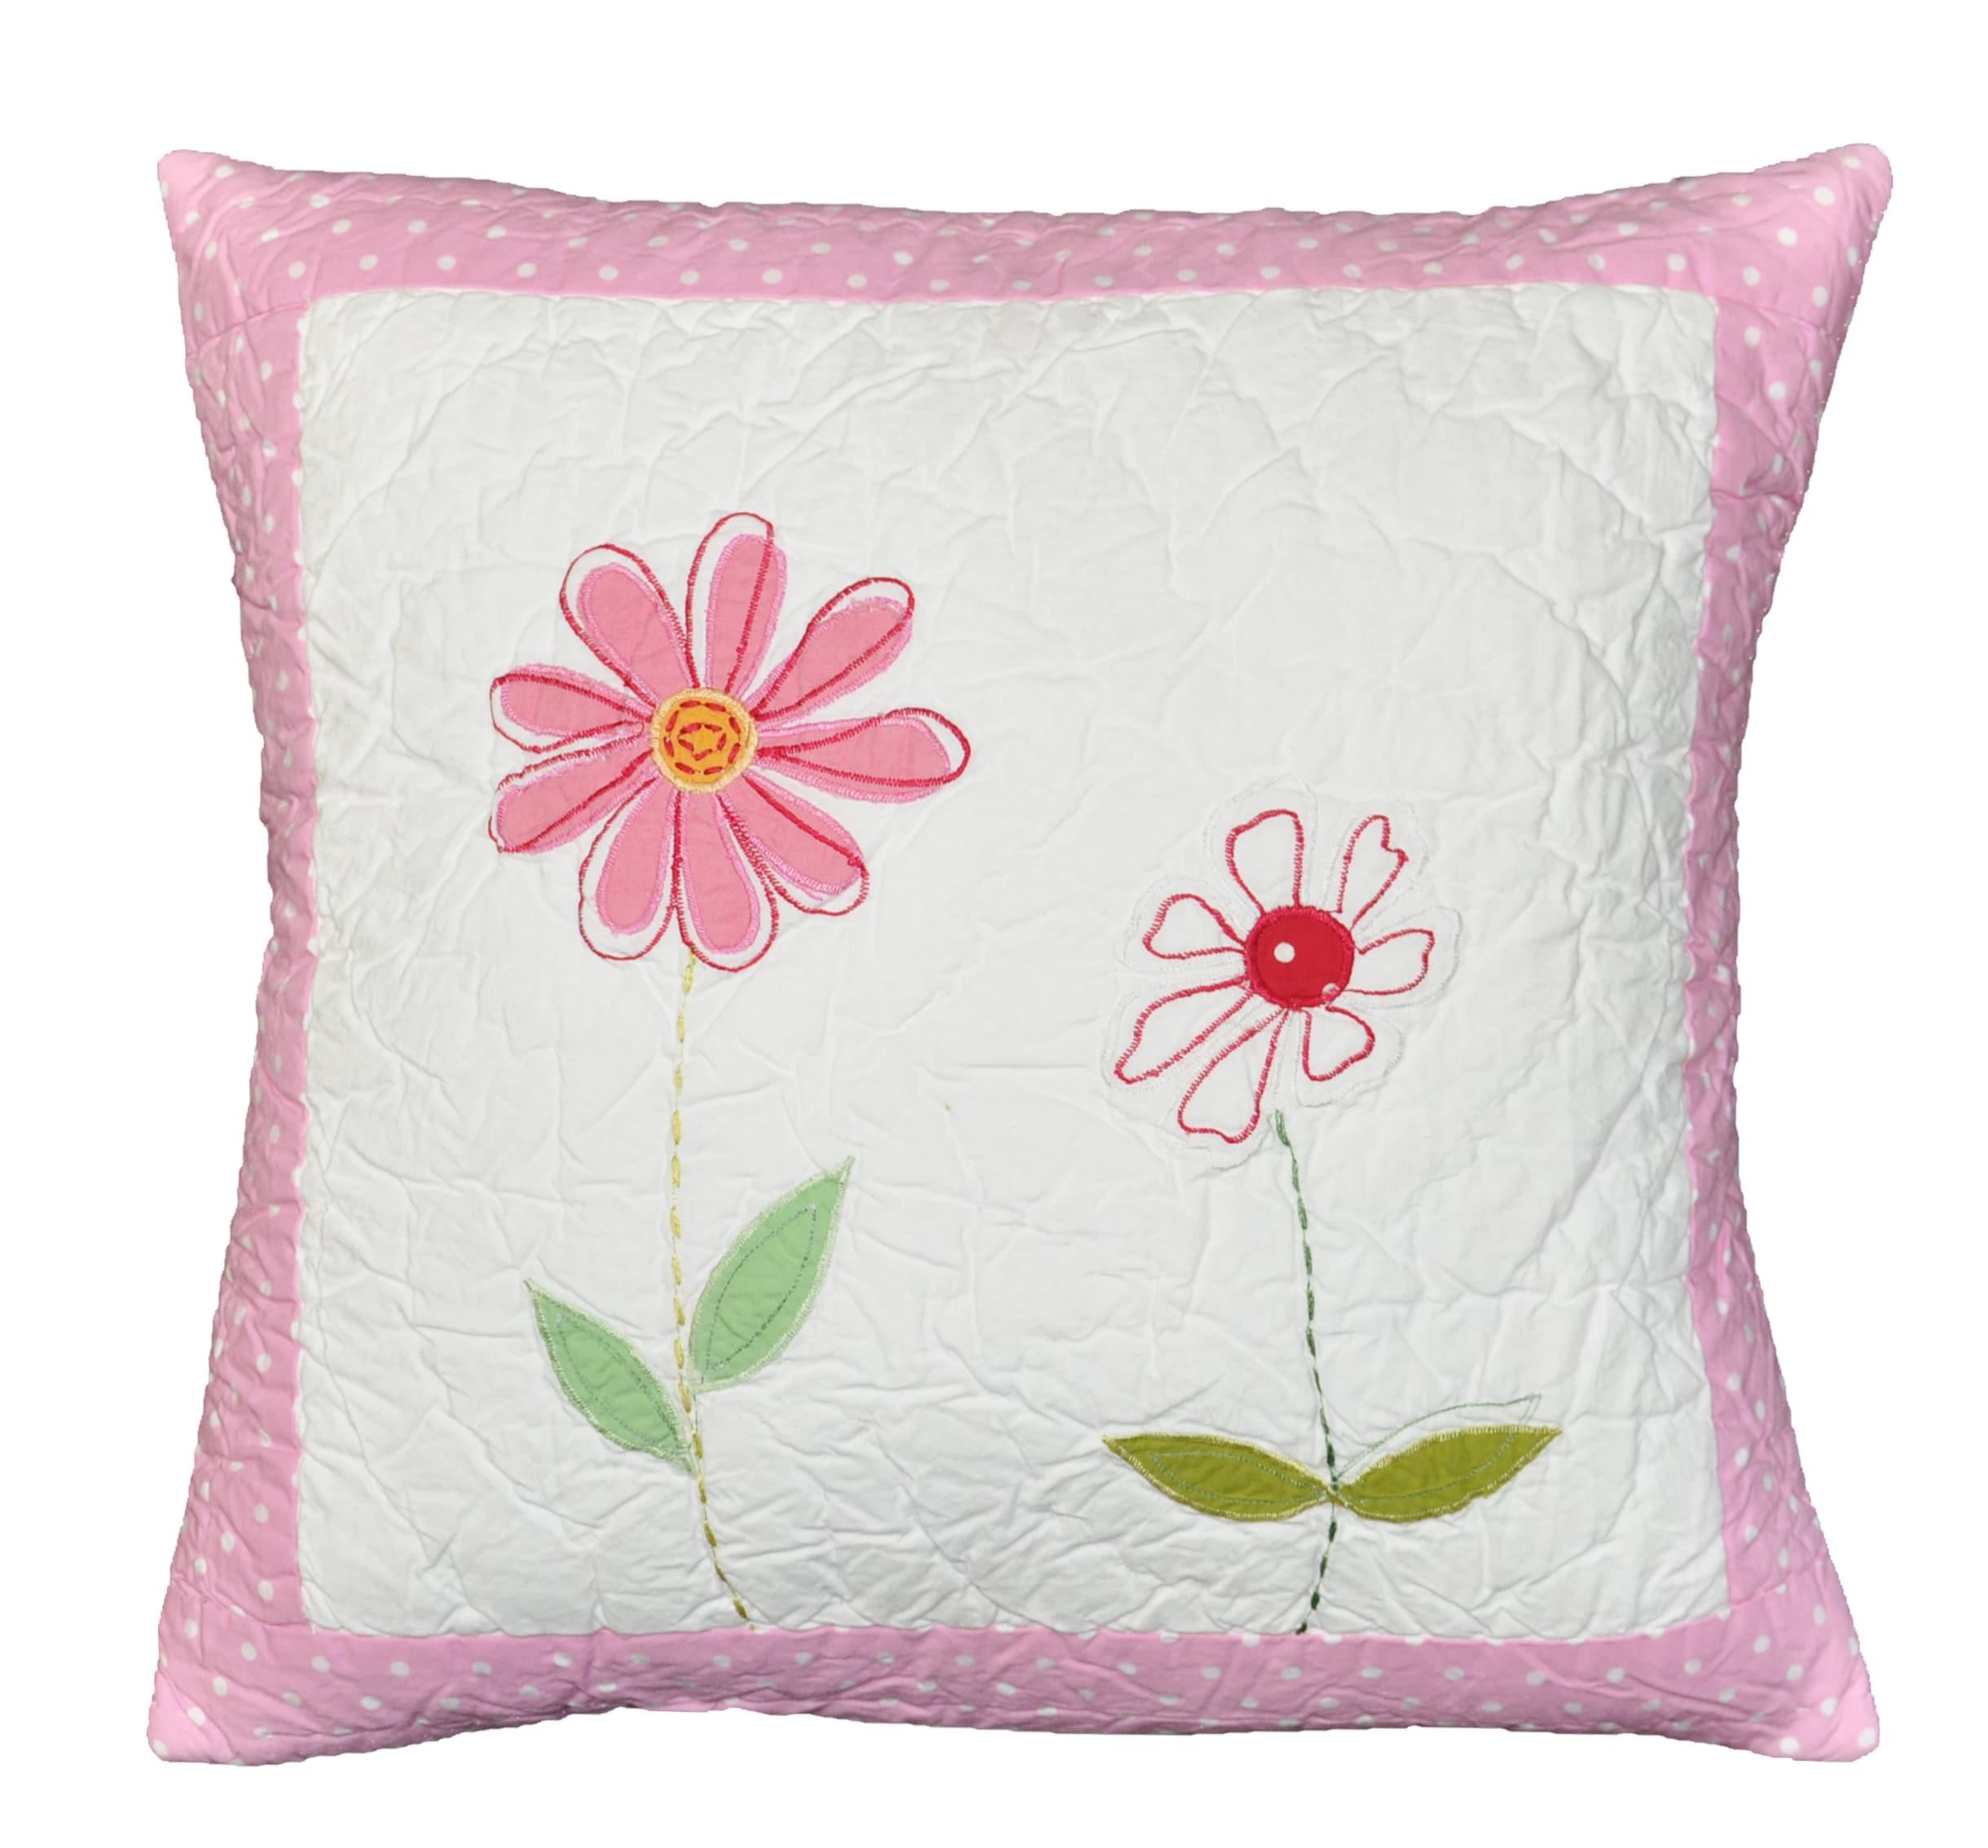 Emily's Flower Decorative Pillow